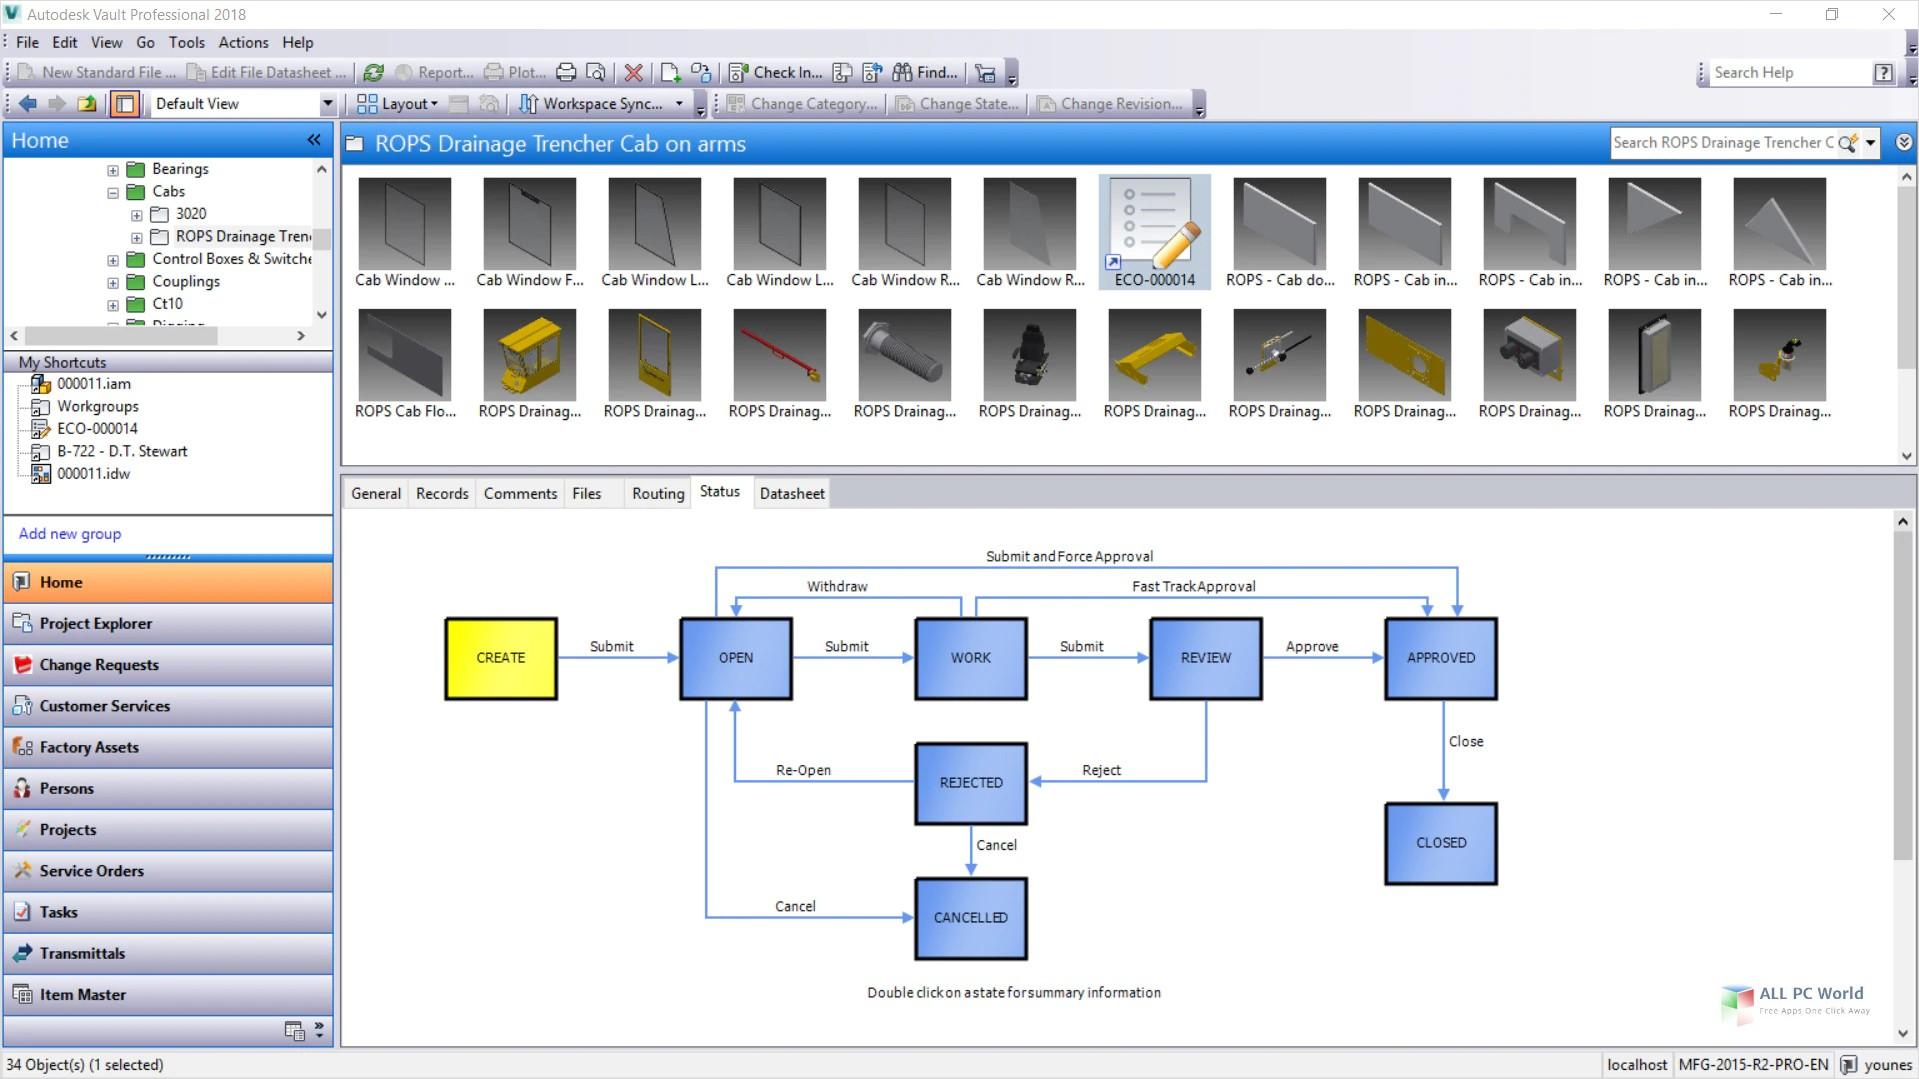 Autodesk Vault Pro Server 2020